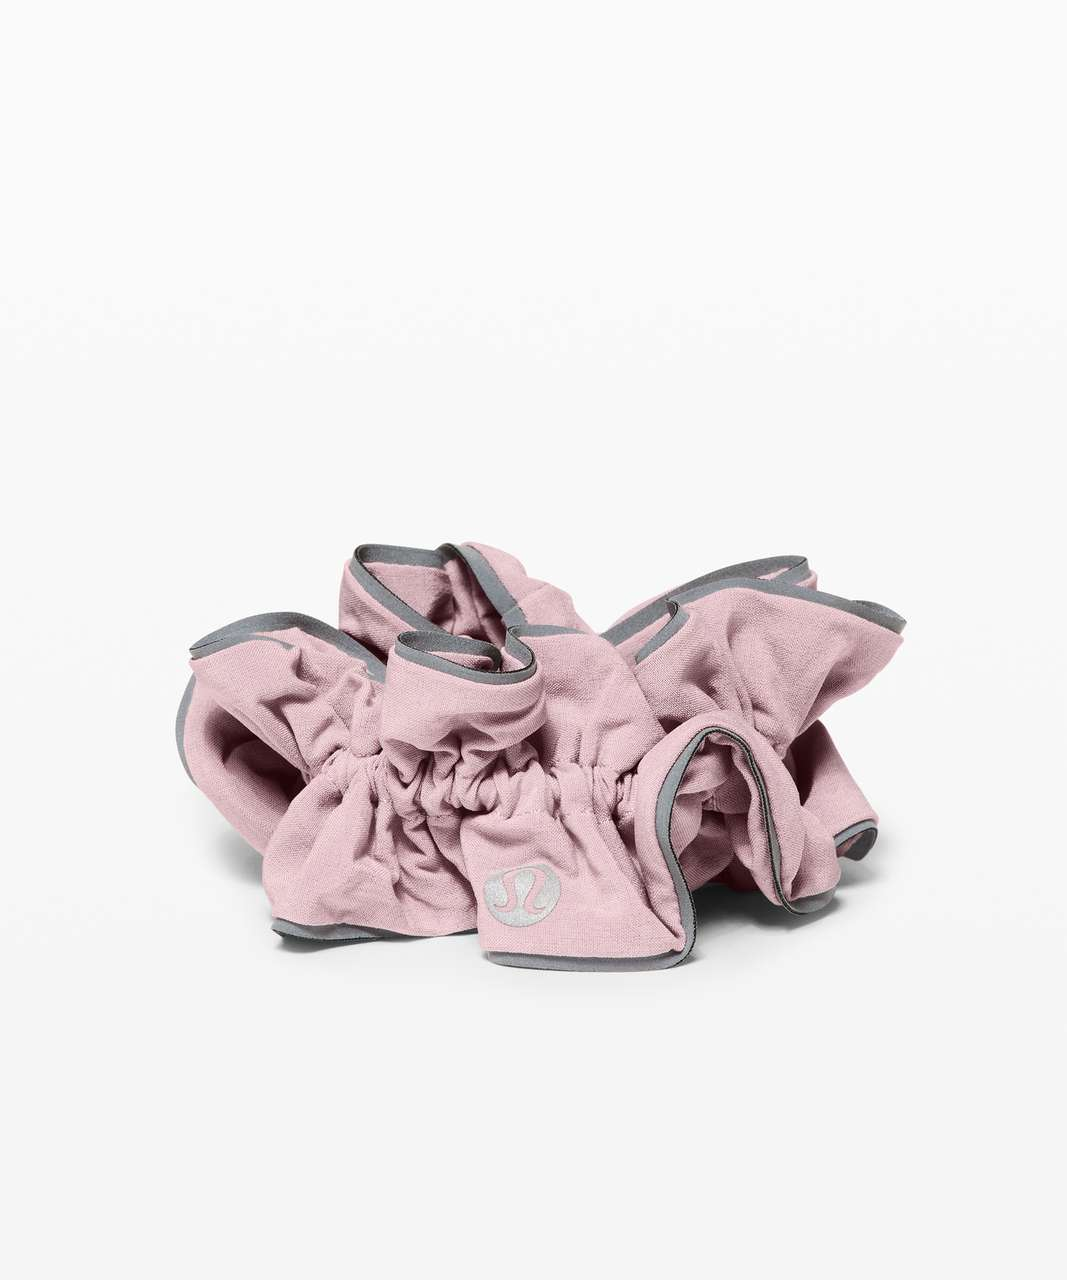 Lululemon Light Locks Scrunchie II - Smoky Blush